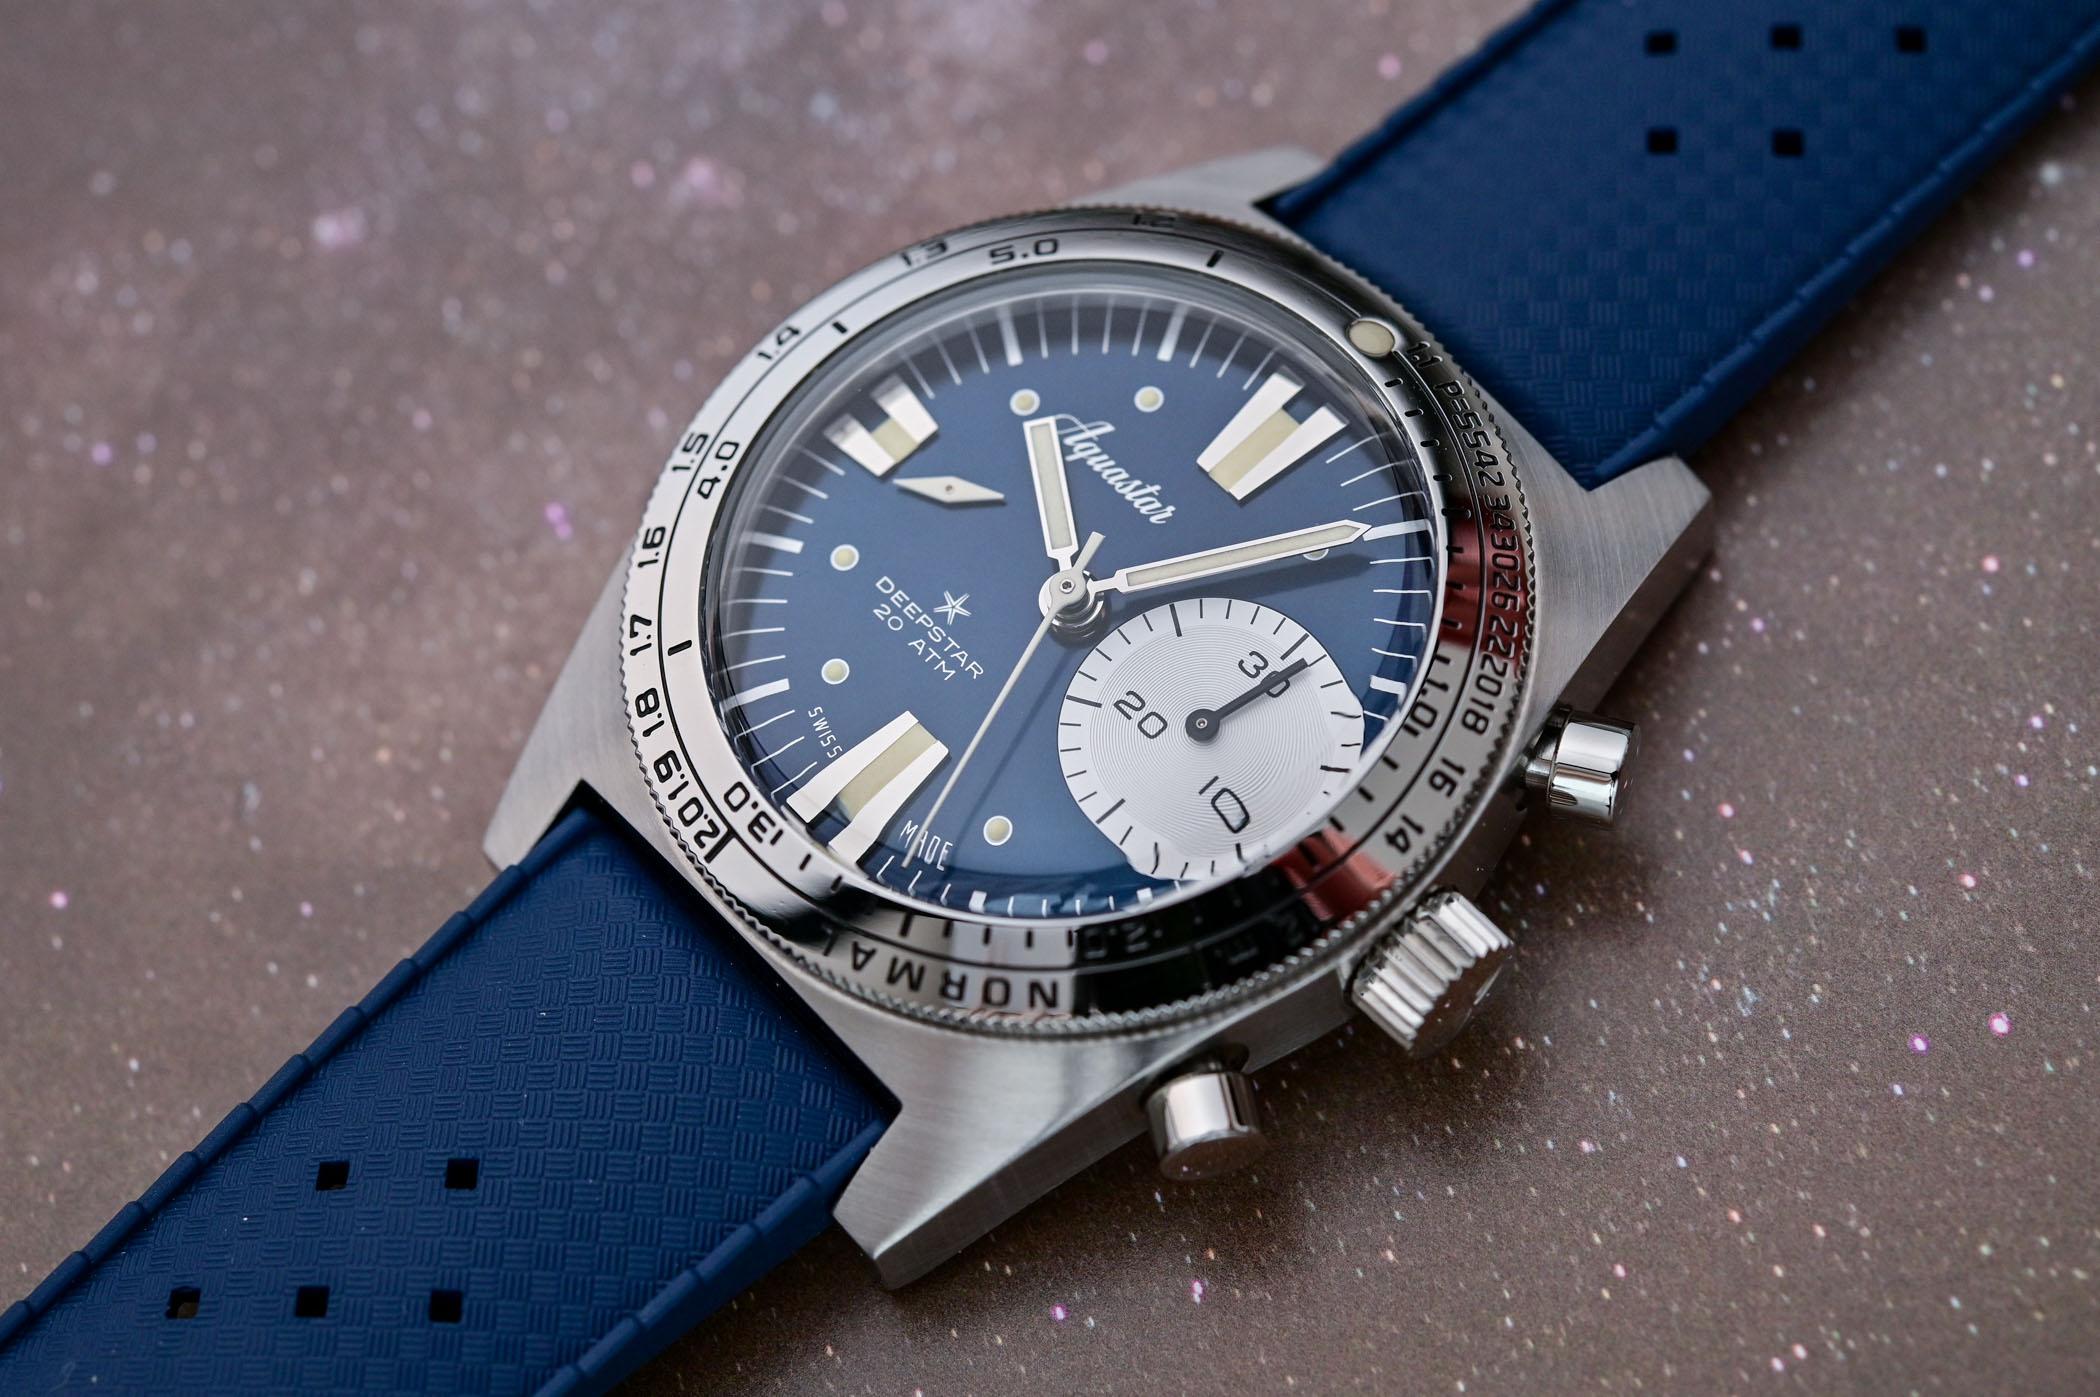 Aquastar Deepstar Chronograph Re-Edition